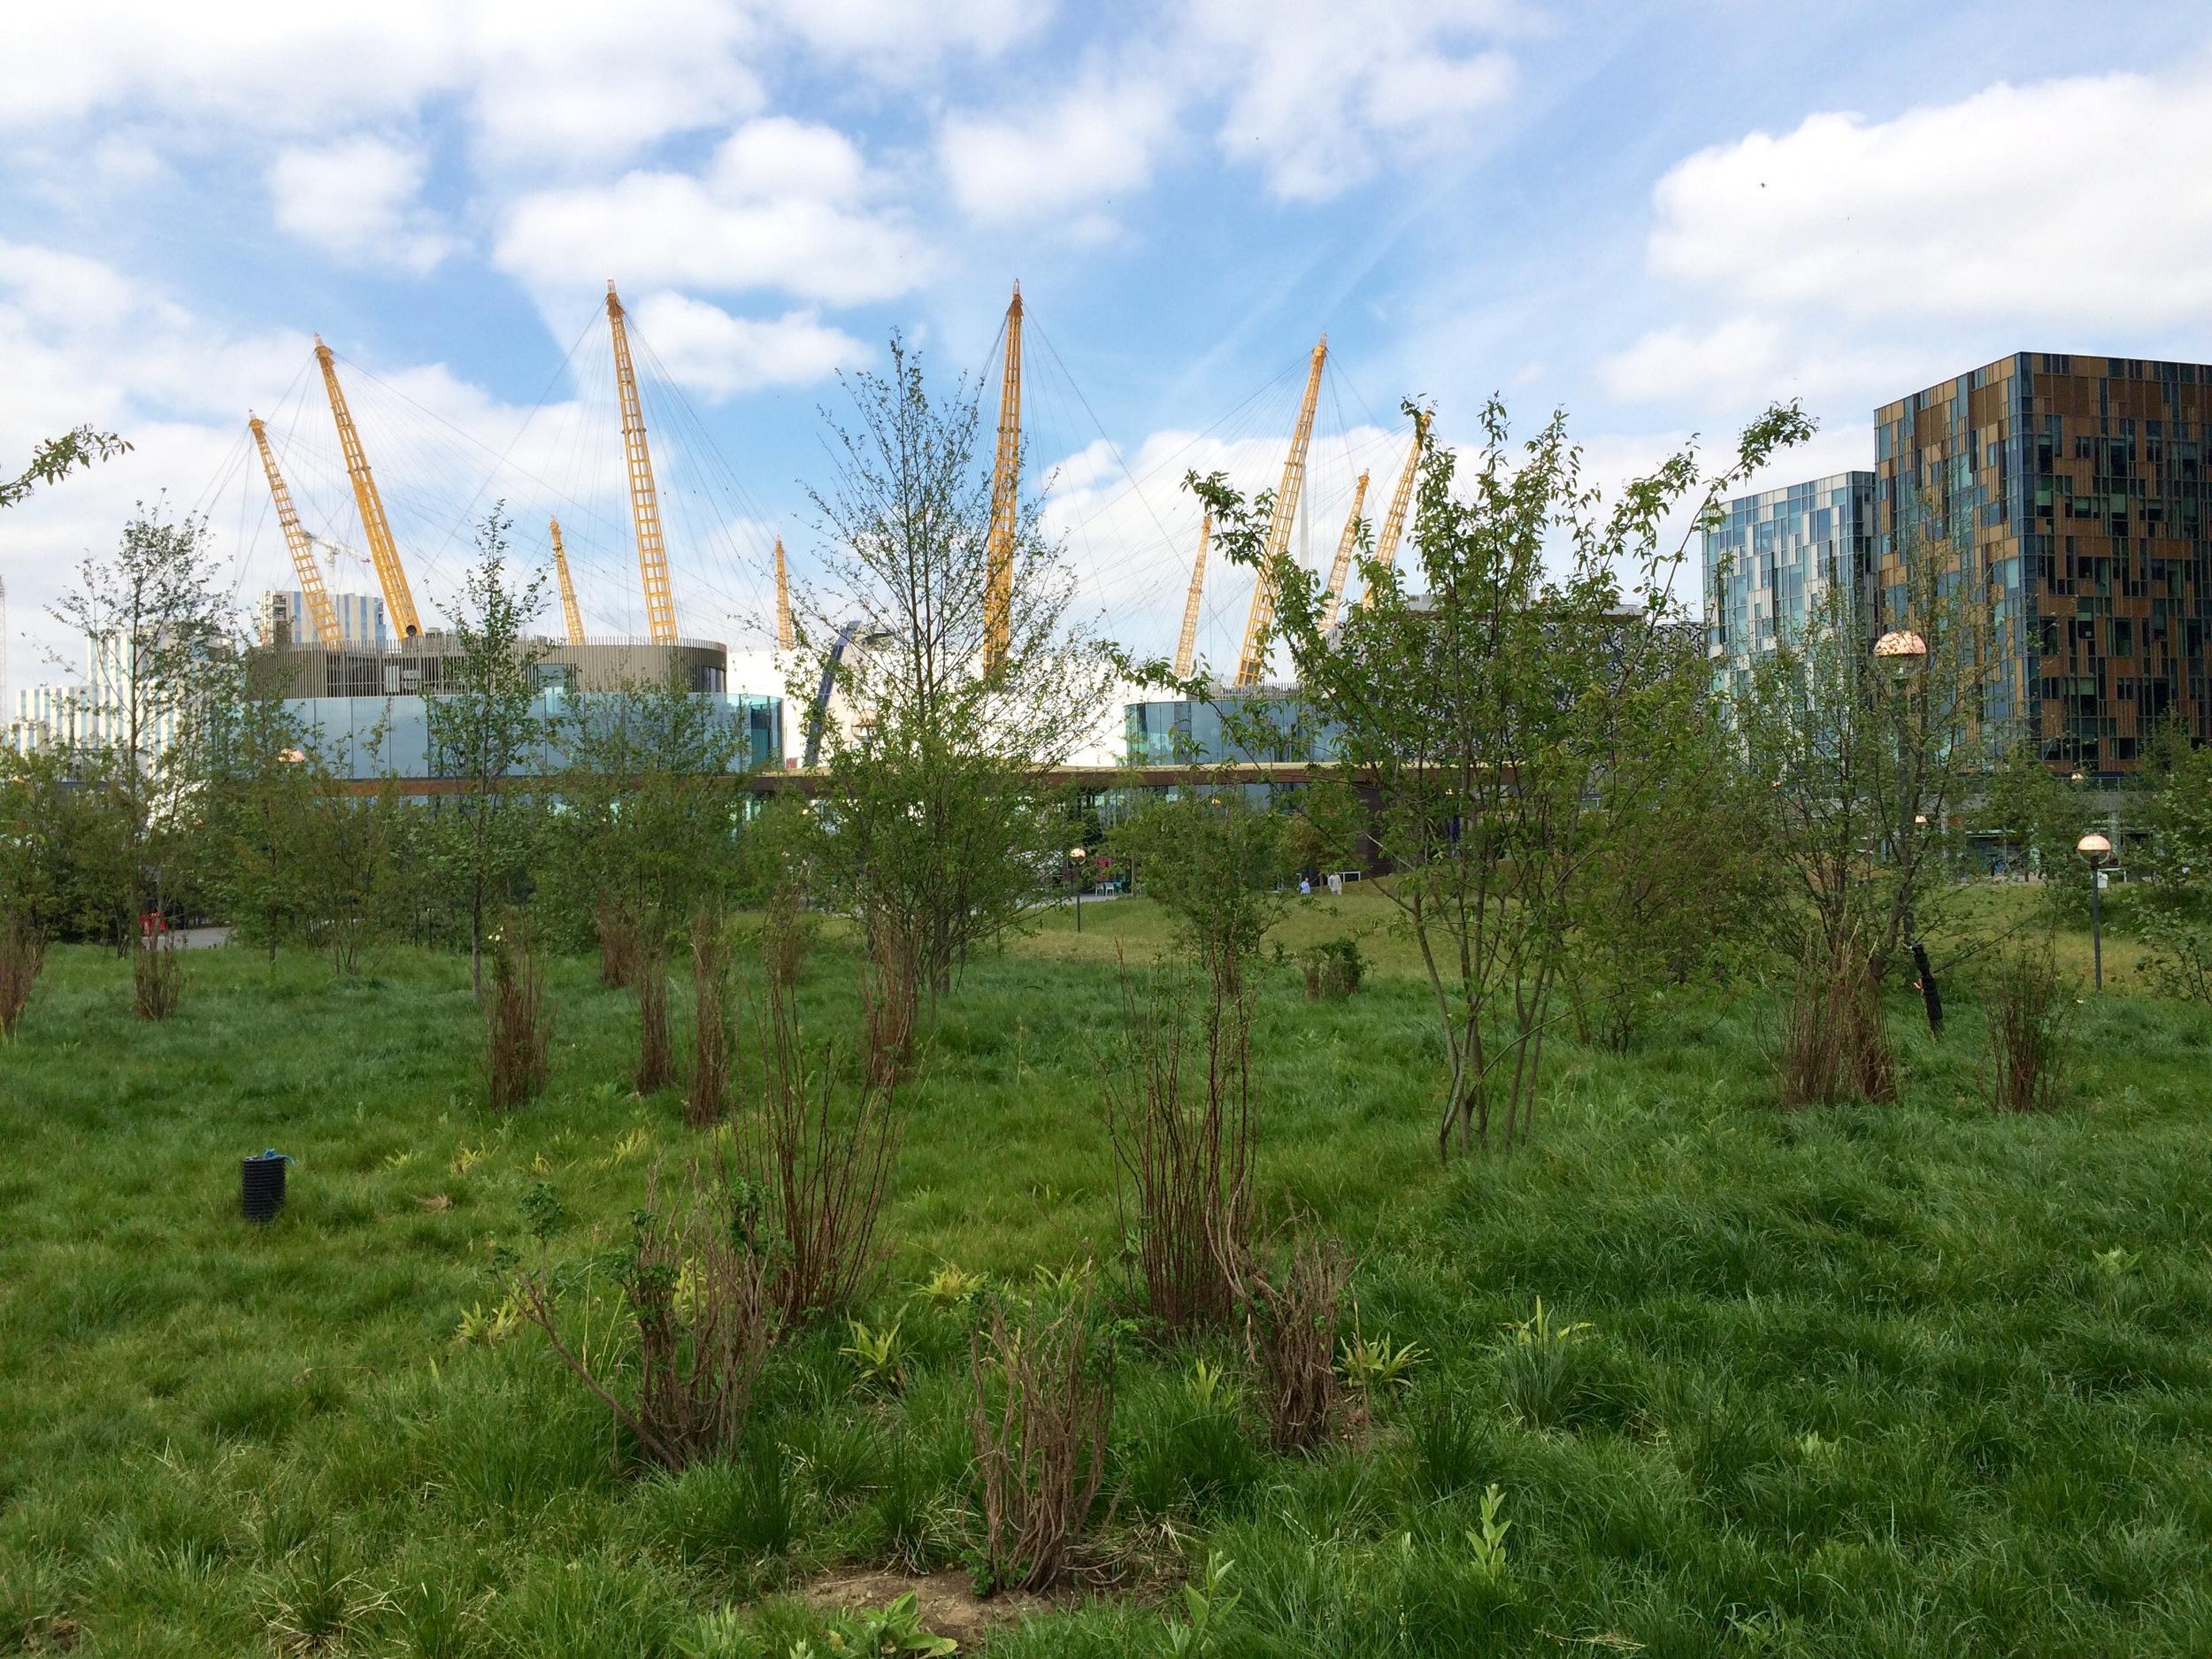 Peninsula Garden on the Greenwich Peninsula -  June 2015  [greenpenlondon]